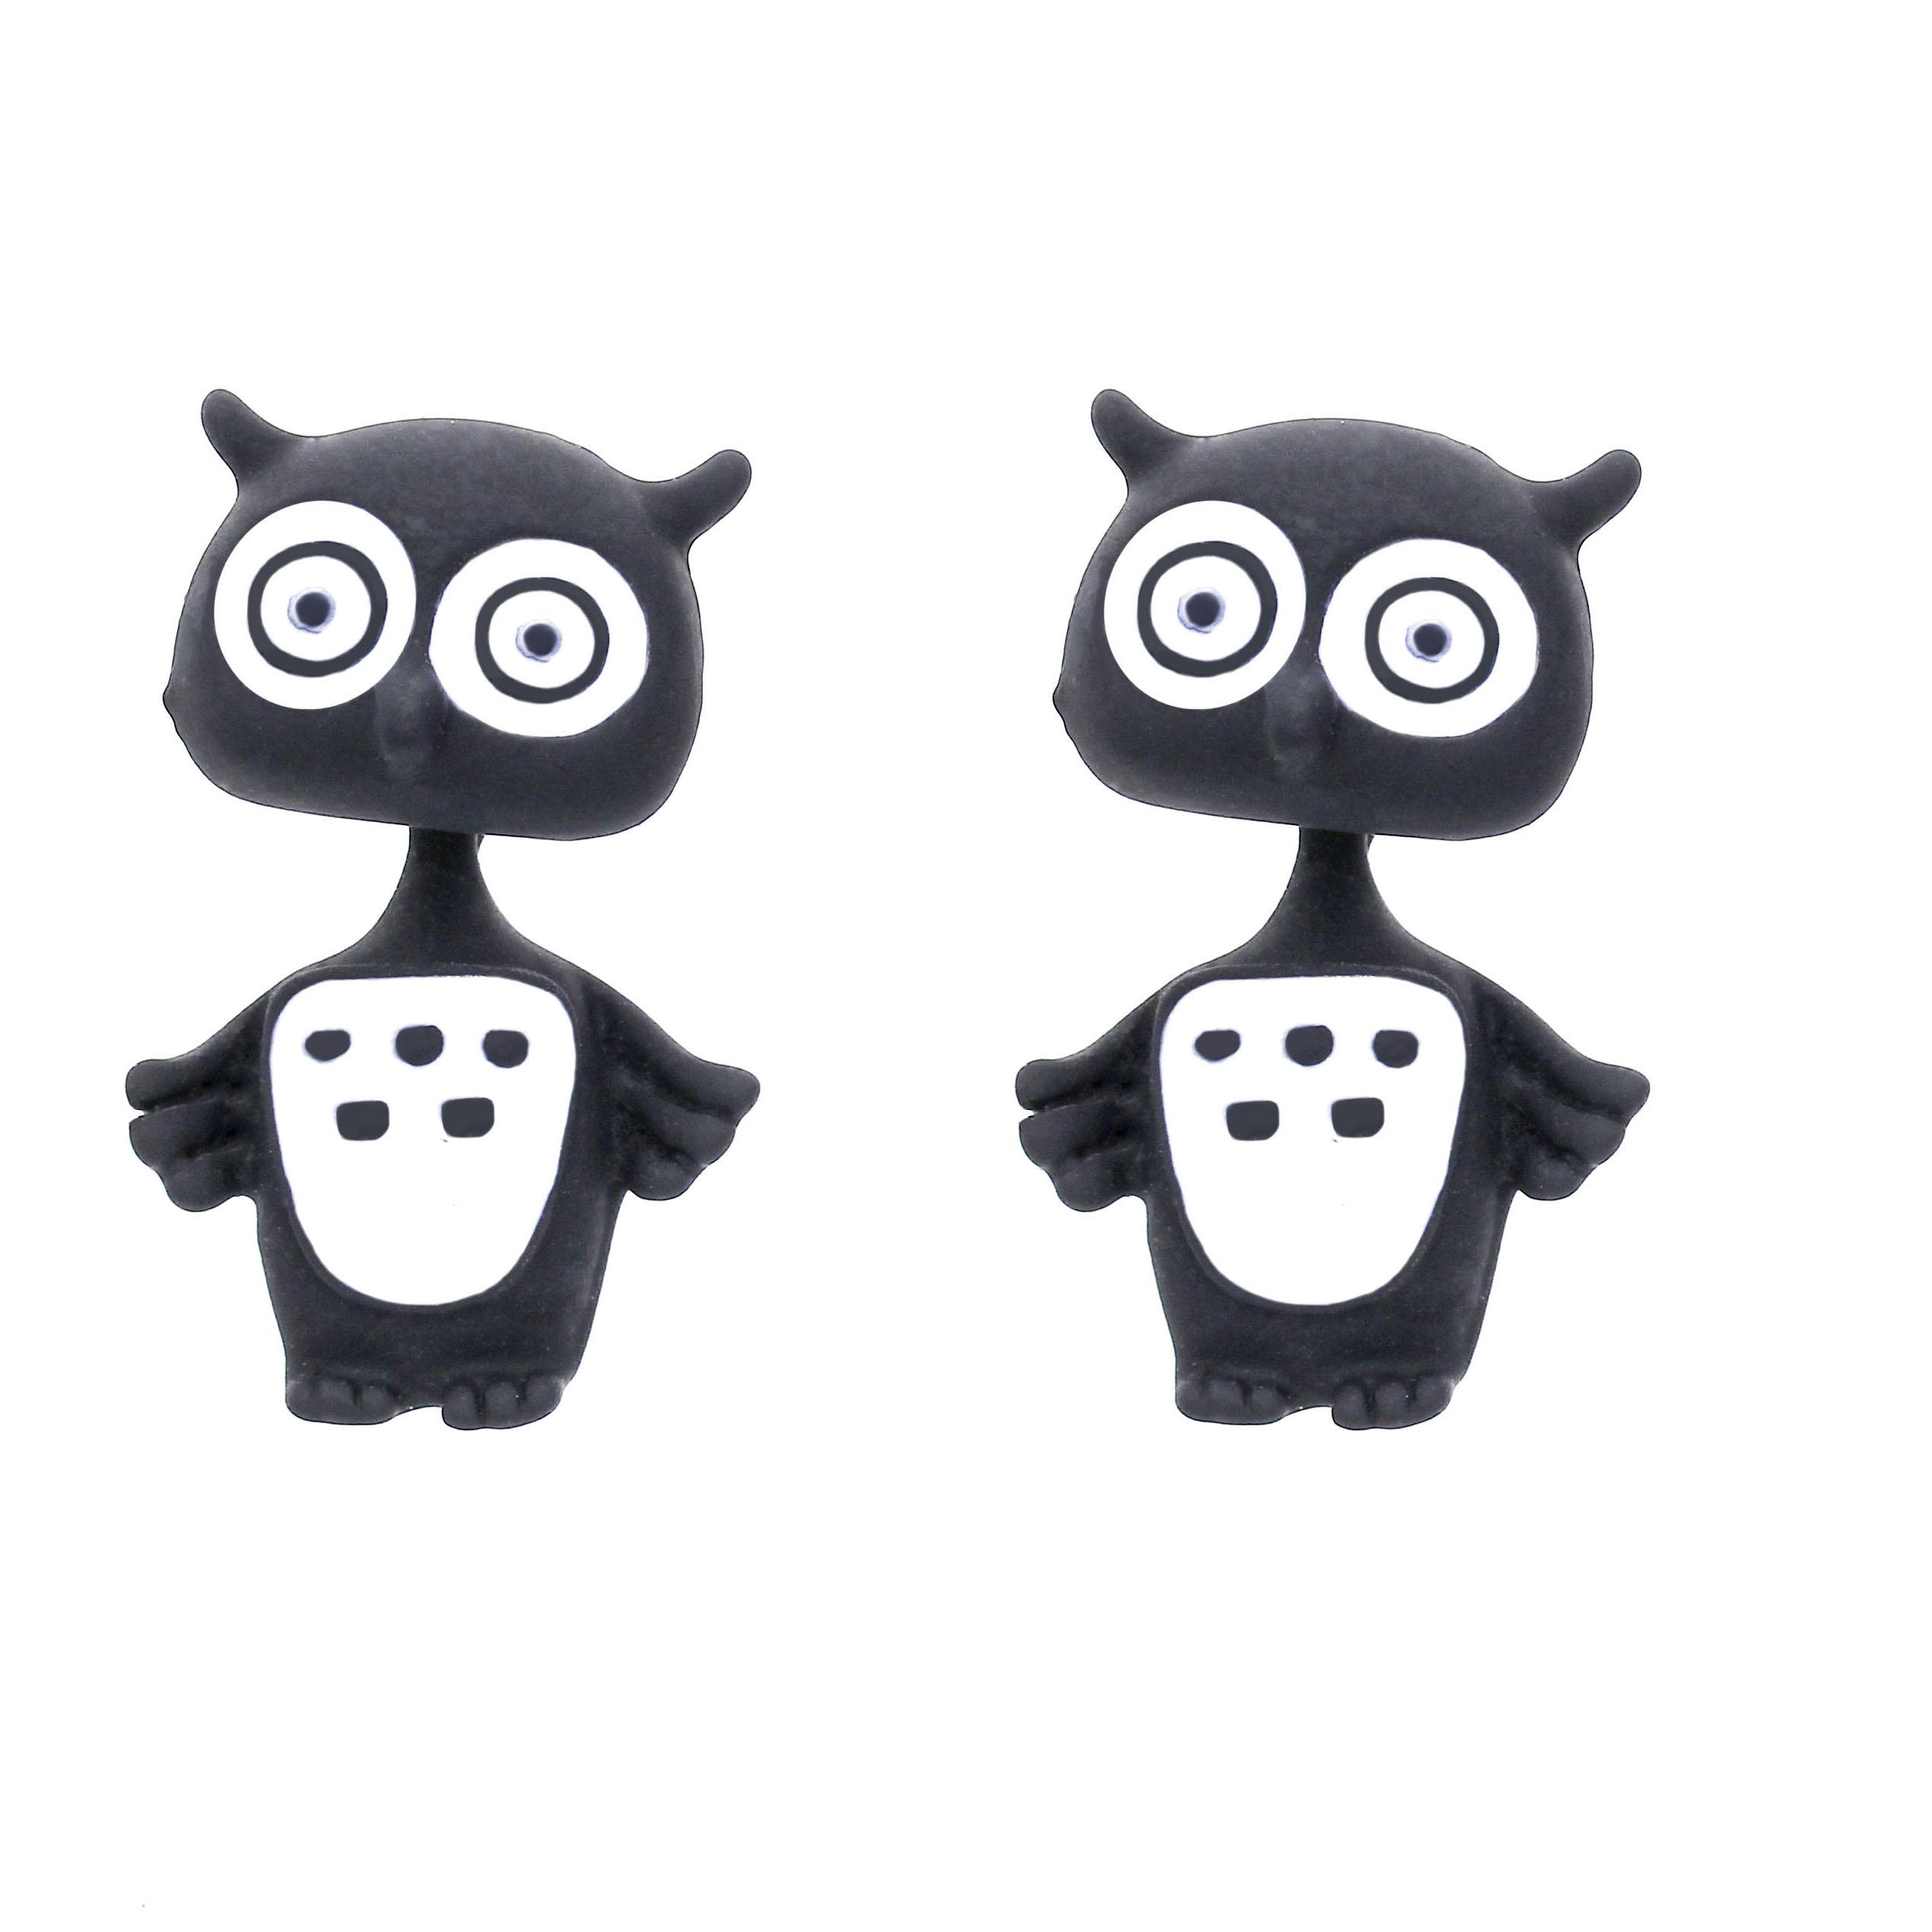 Sunshine New Multiple Color Polymer Clay 3d Owl Stud Earrings For Women  Gifts Kawaii Animal Earrings